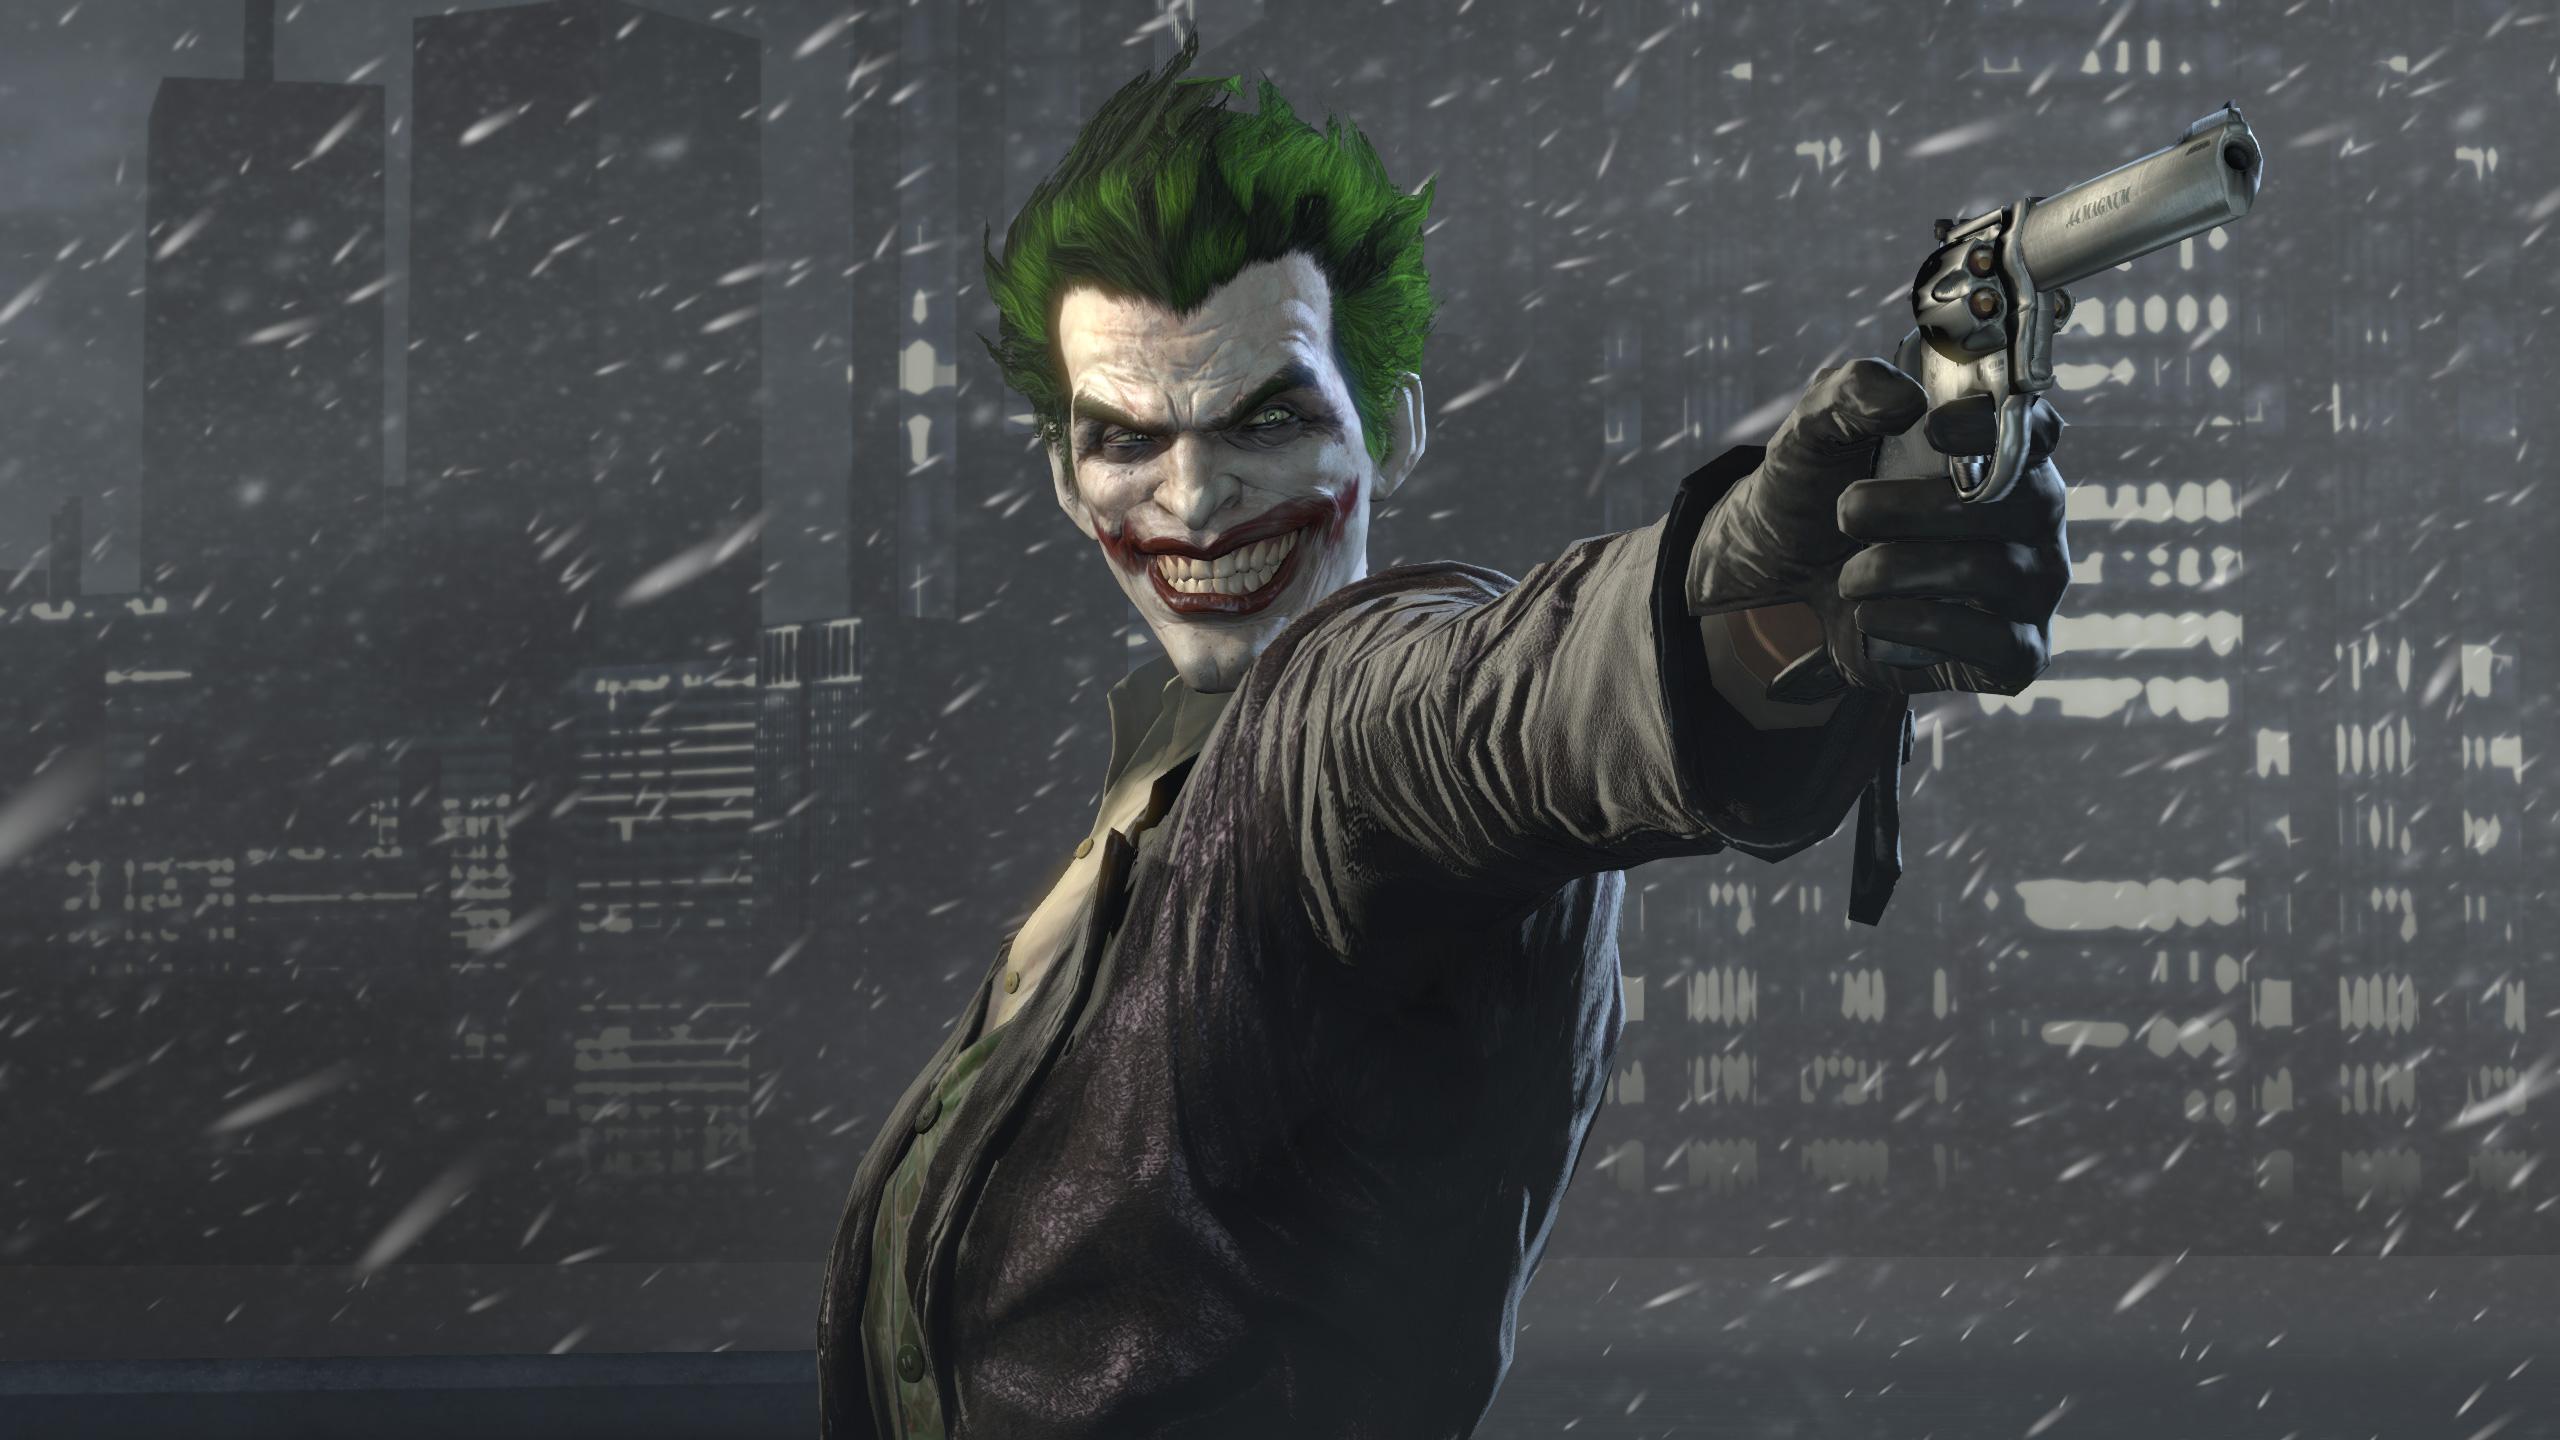 Joker Batman Arkham Origins, HD Games, 4k Wallpapers ...